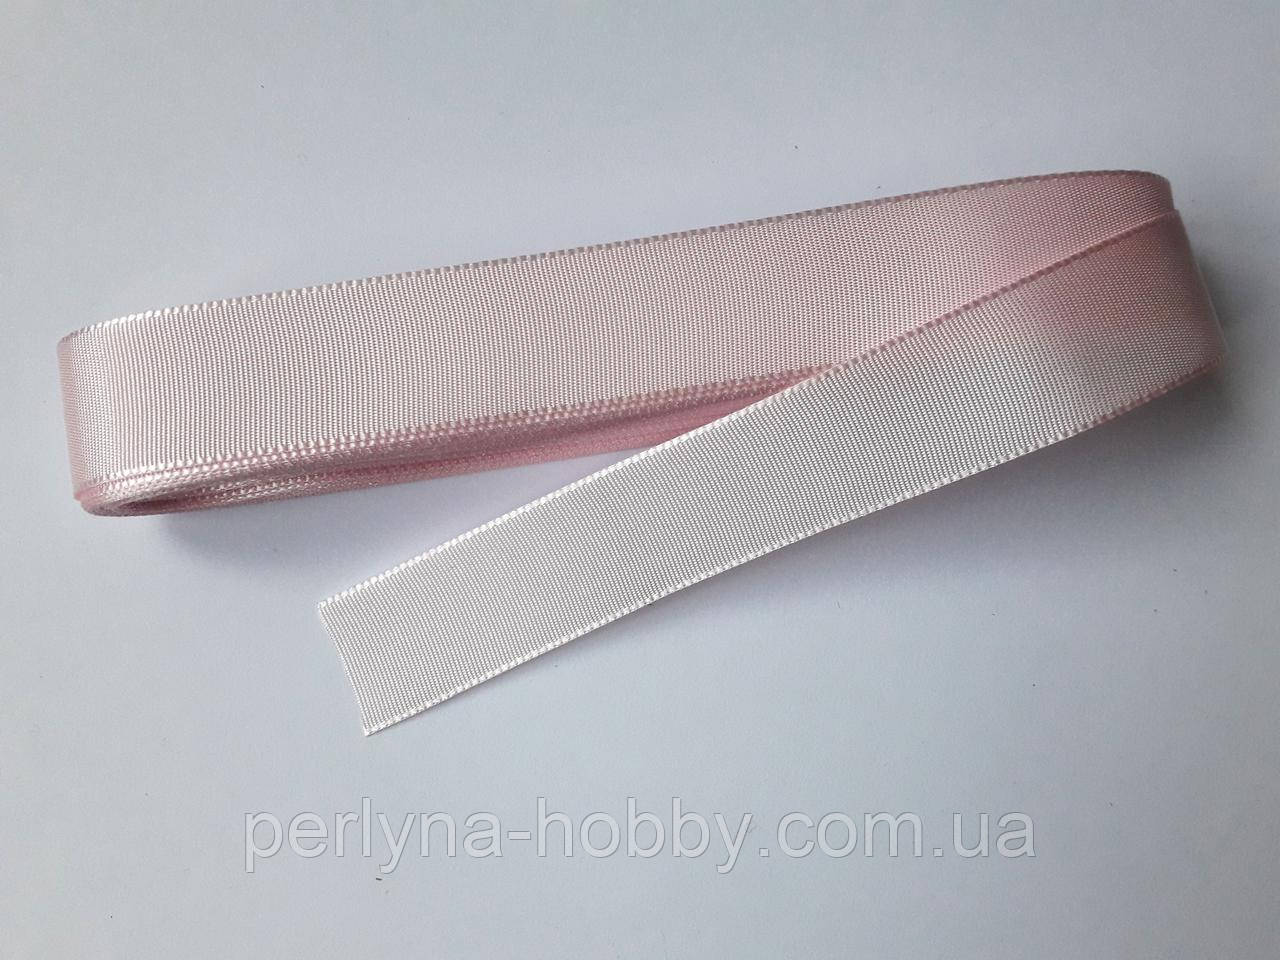 Стрічка репсова 2 см( 10 метрів) рожева пастельна № 16